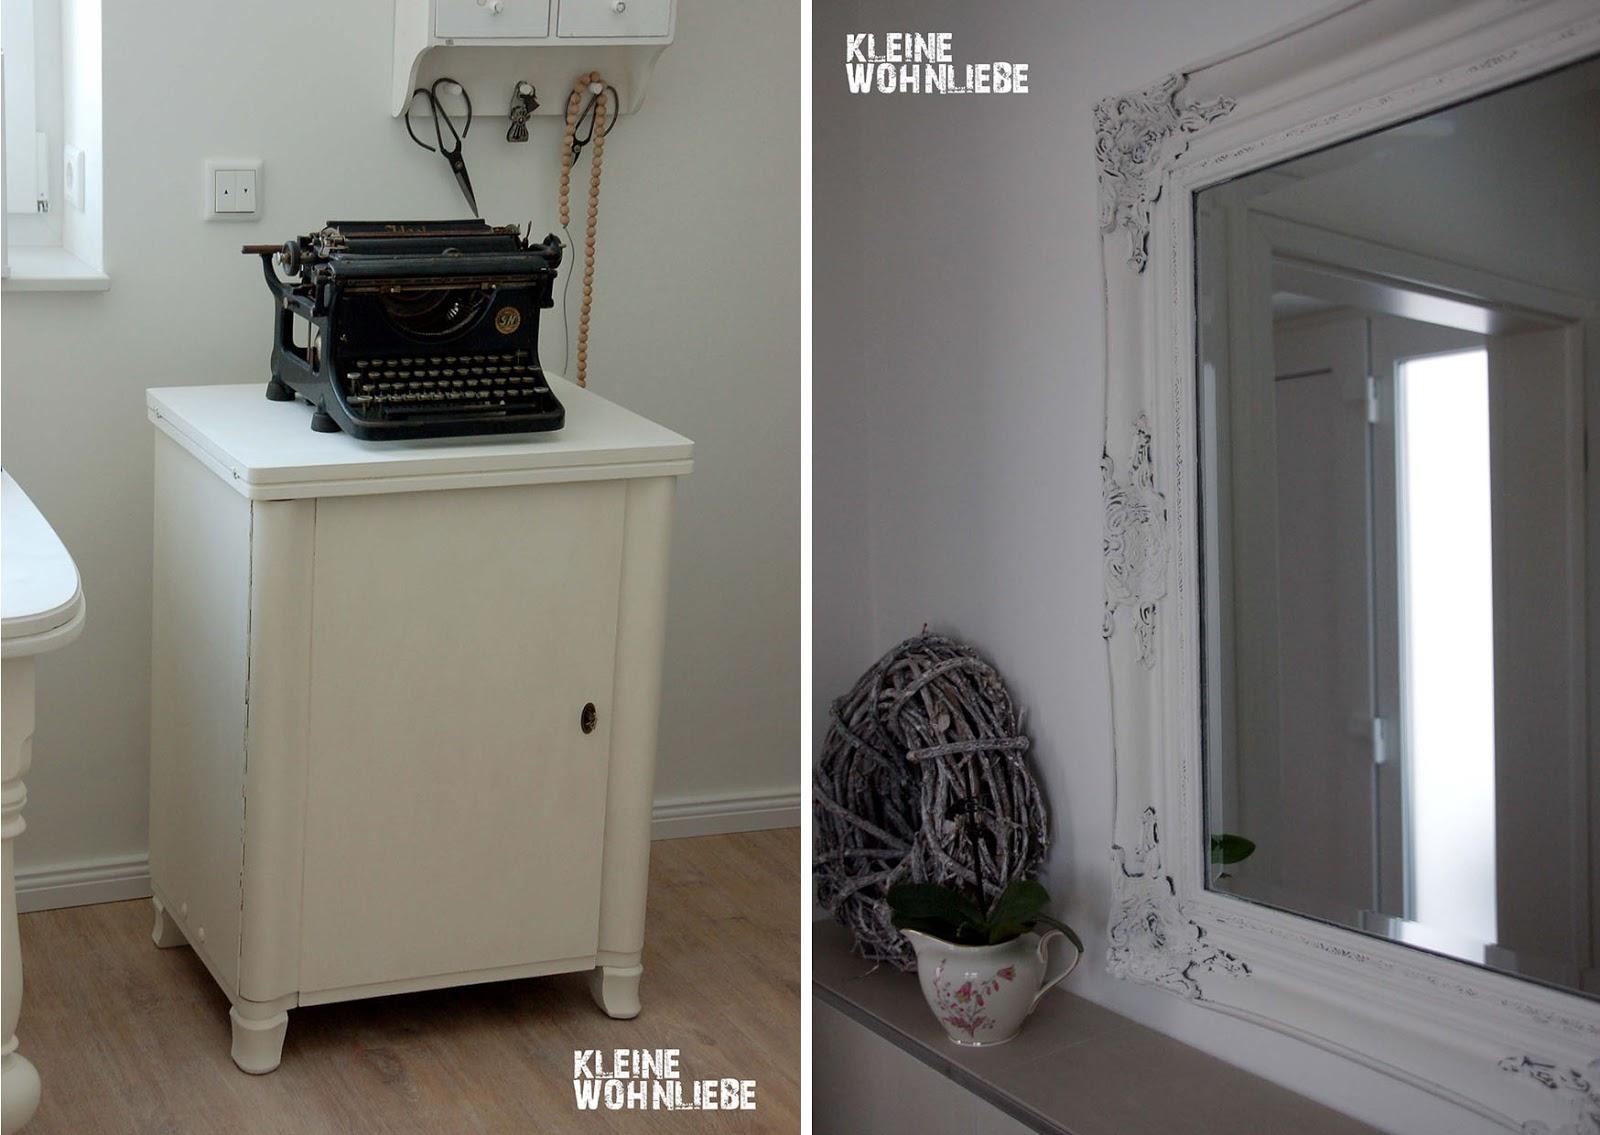 Emejing Alte Badezimmer Verschönern Images - Ridgewayng.com ...